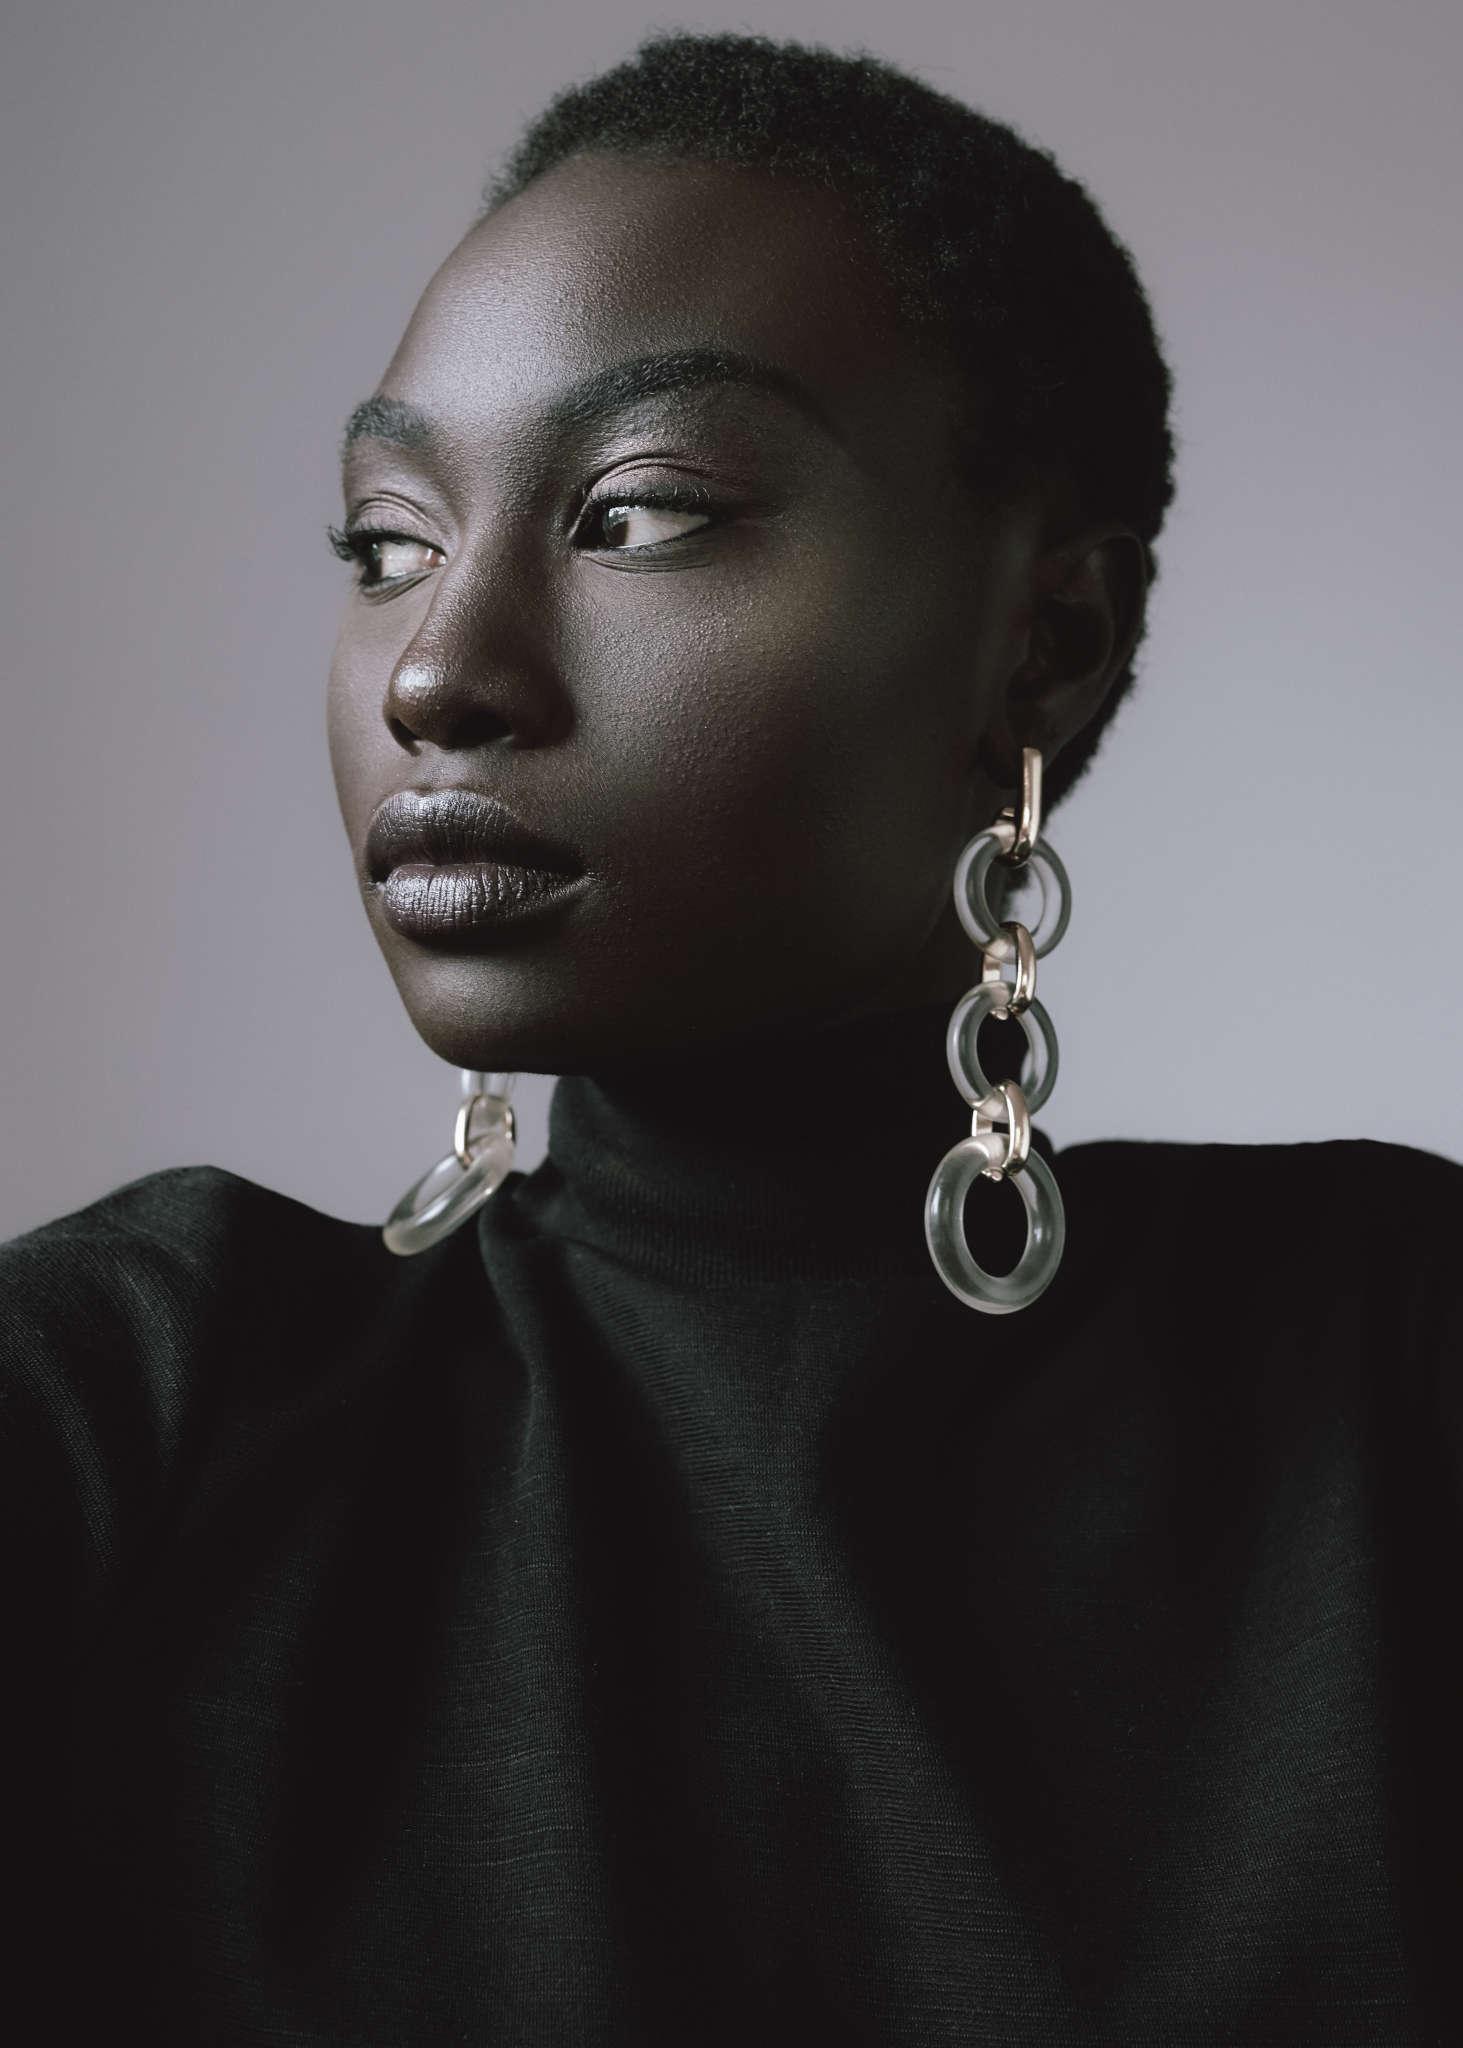 Zara dress and earrings